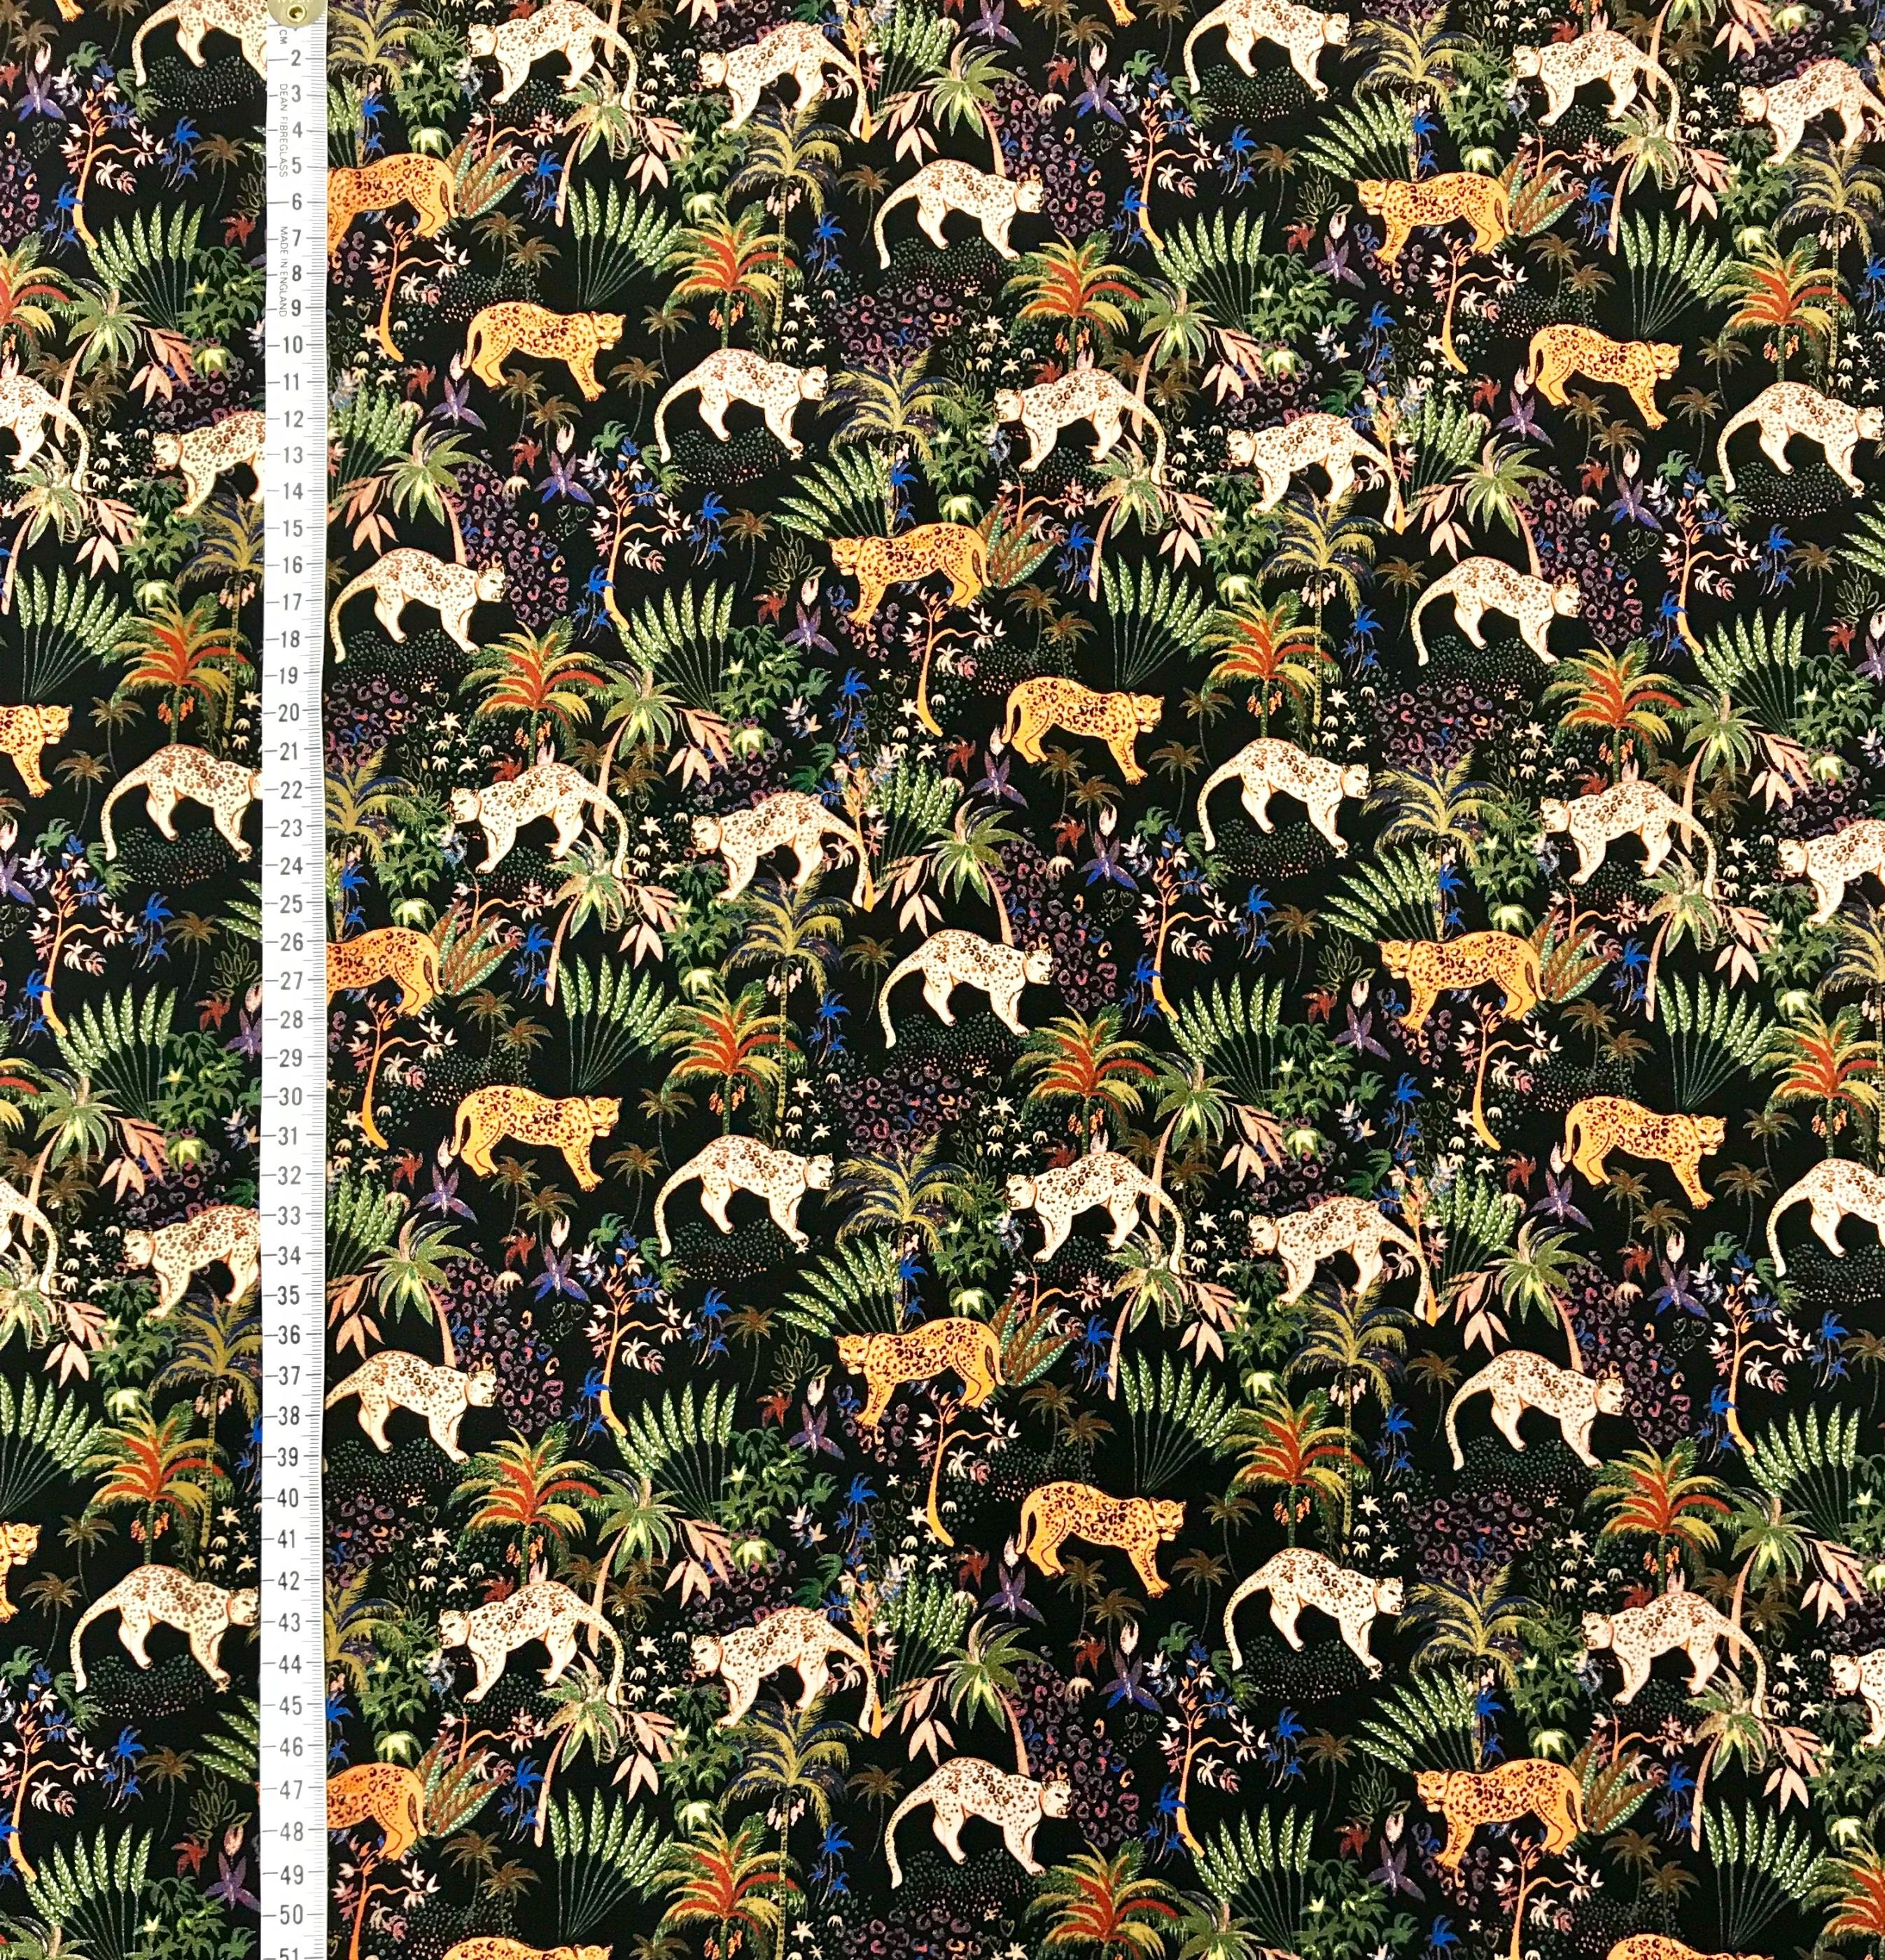 Lilla djungeln leopard viskos tyg metervara mode Tyglust